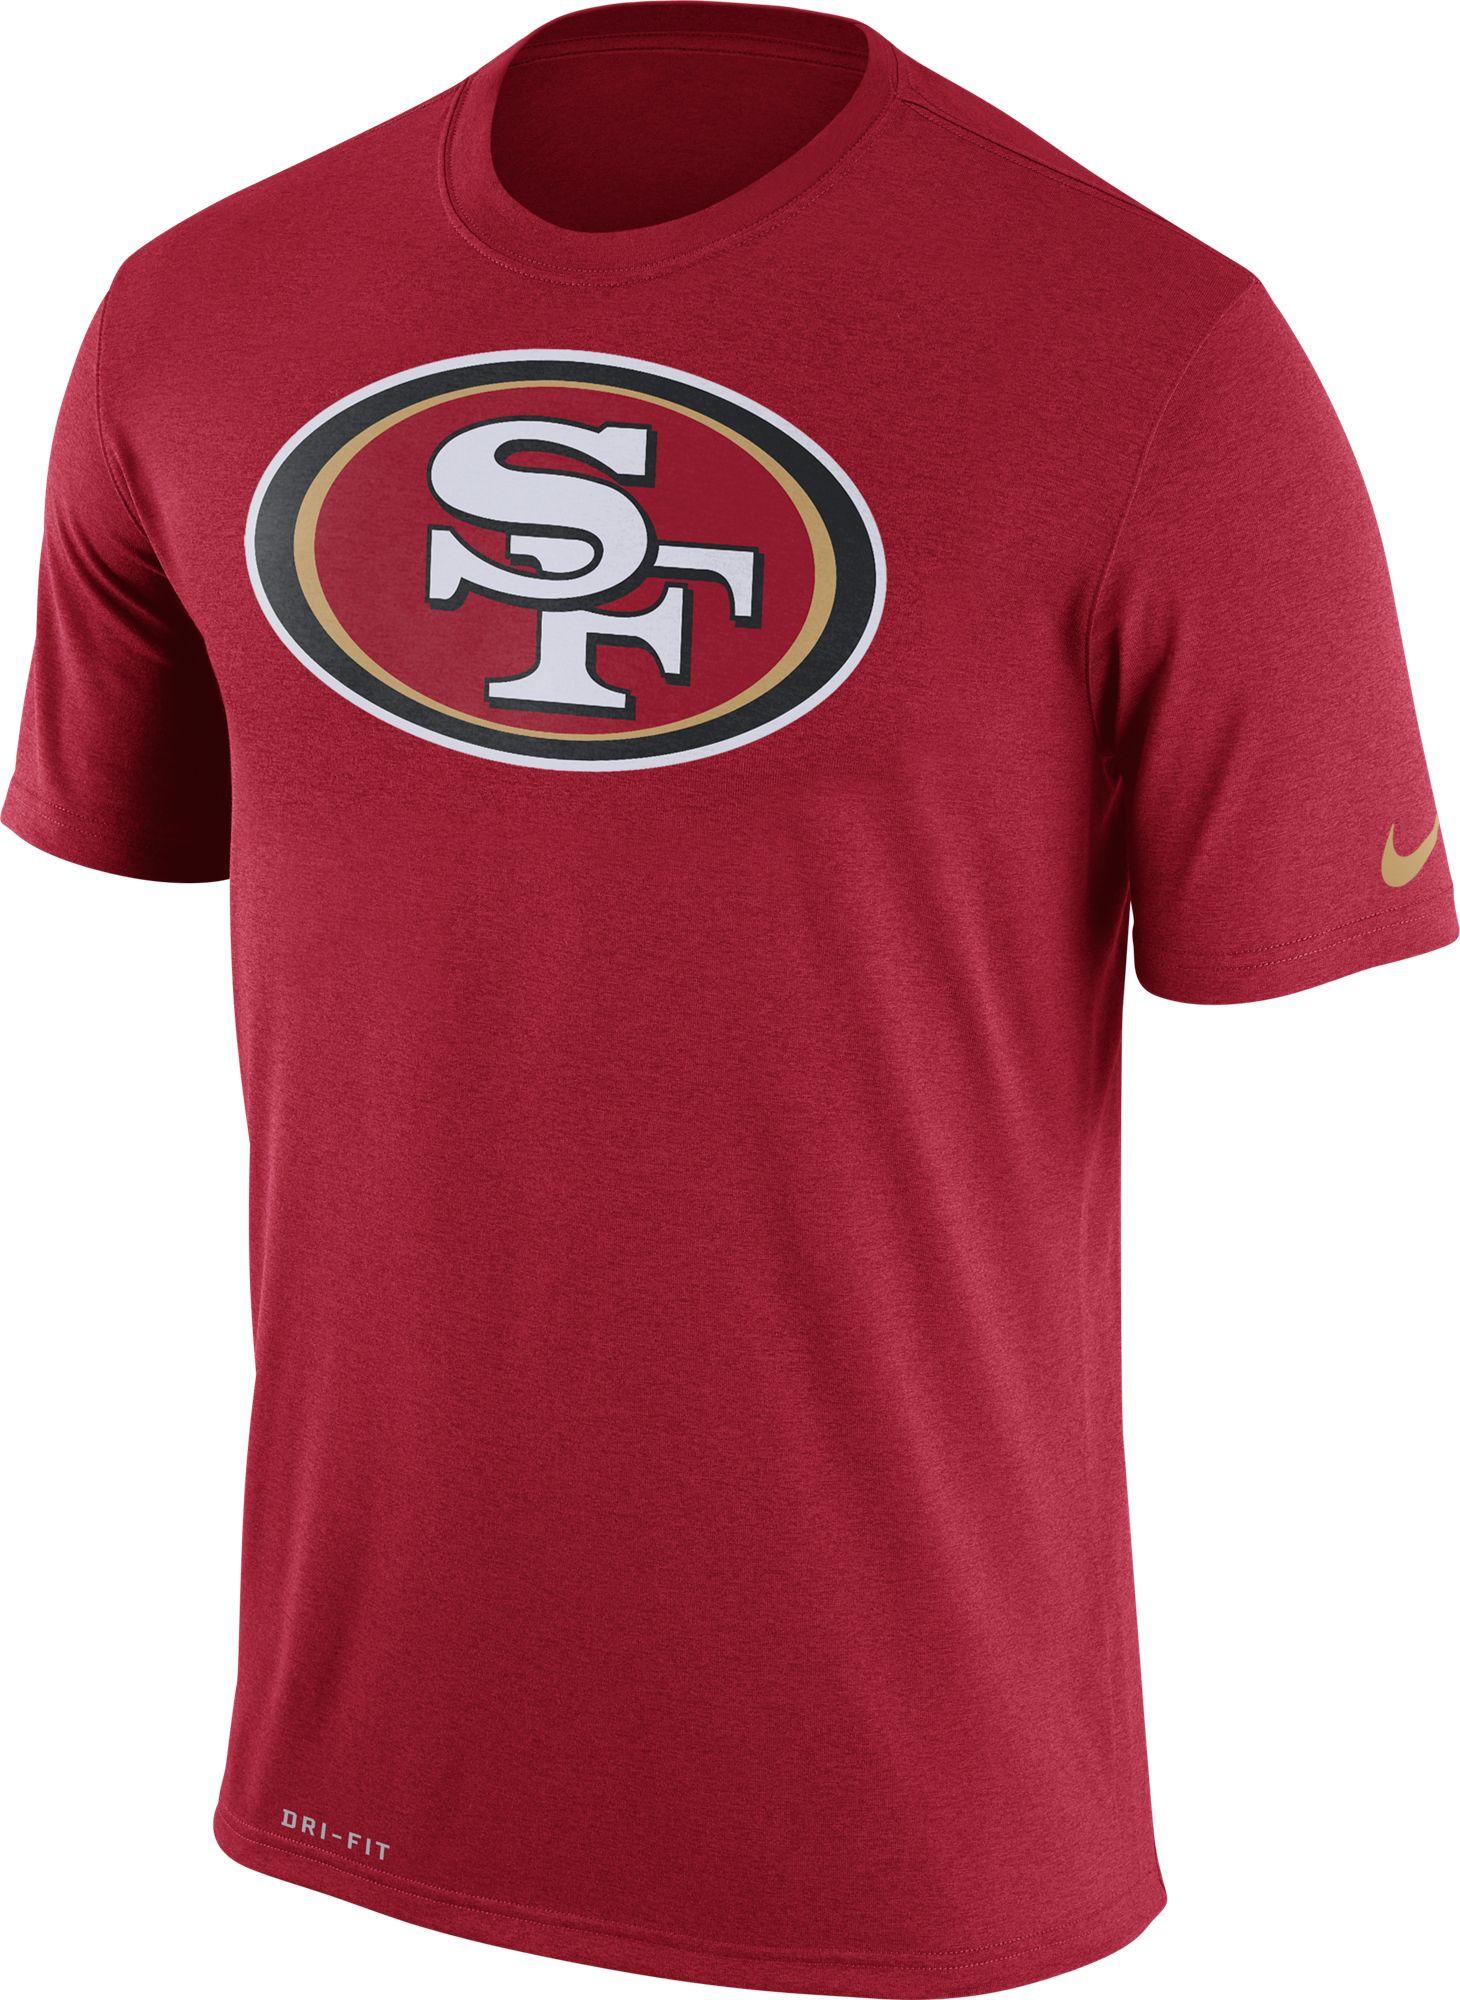 49er t shirts